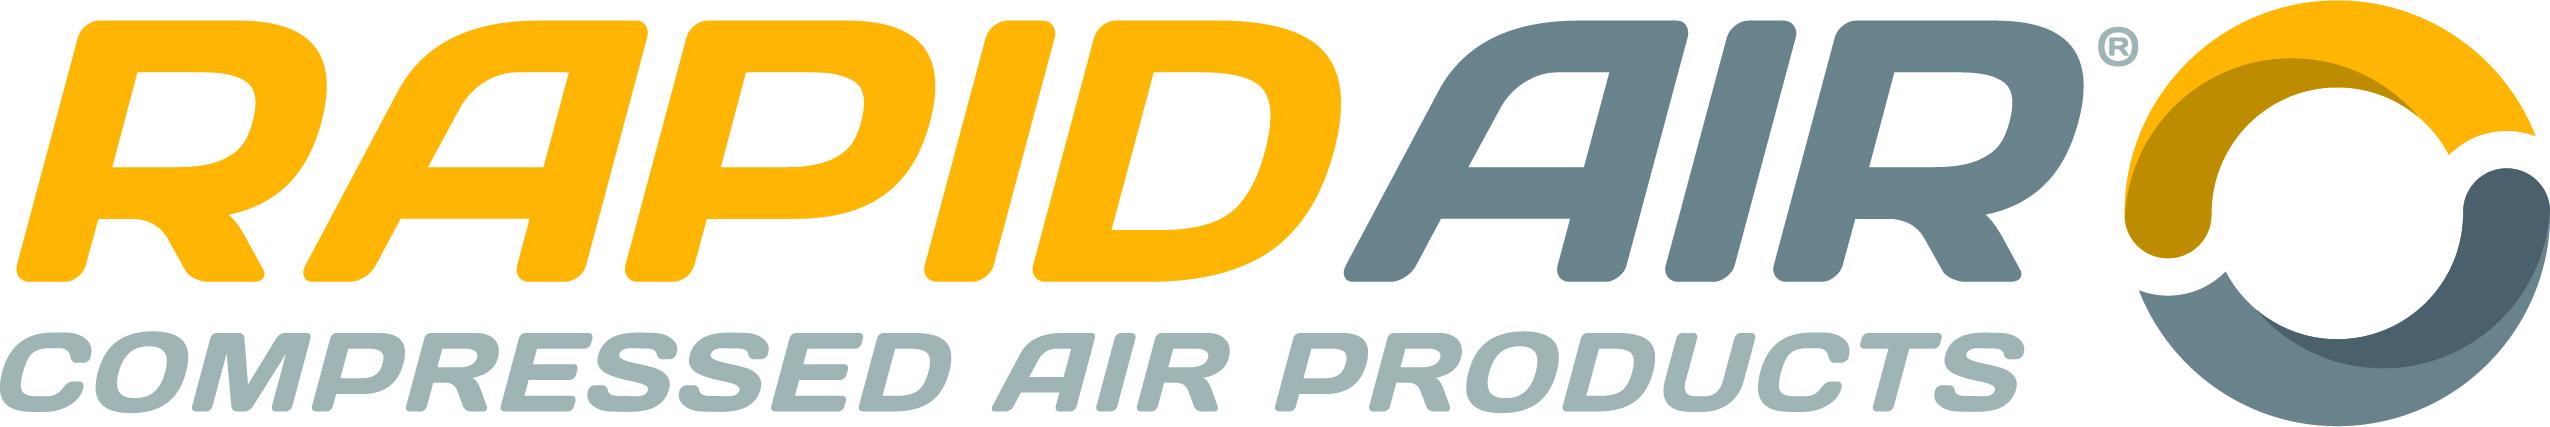 Engineered Specialties, LLC logo